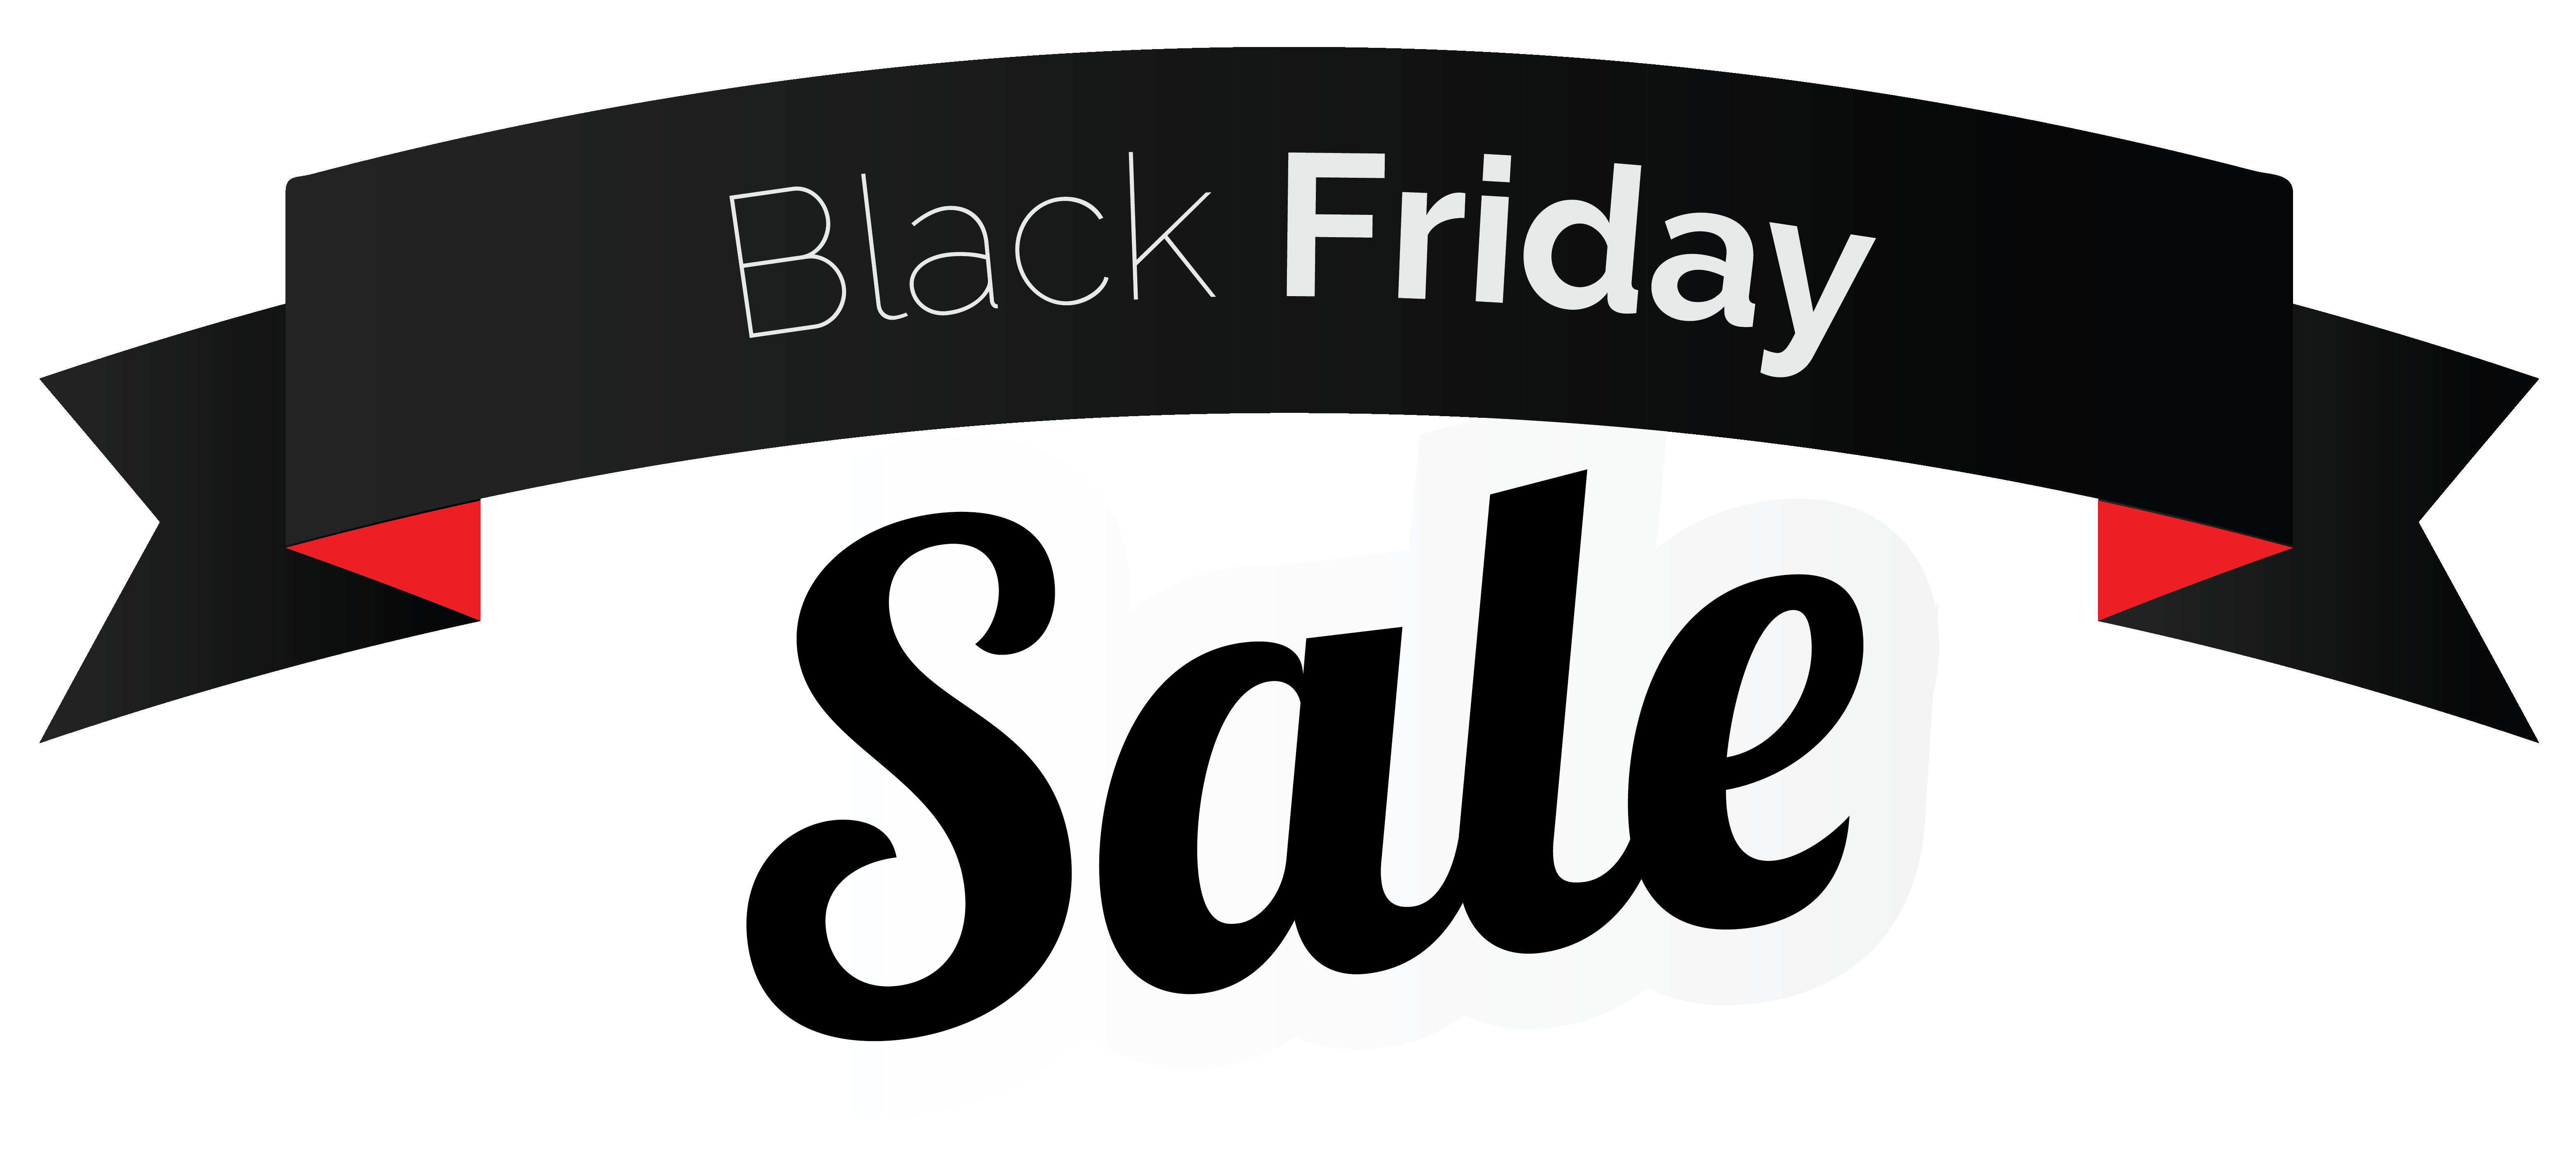 Banner clipart logo. Black friday sale png